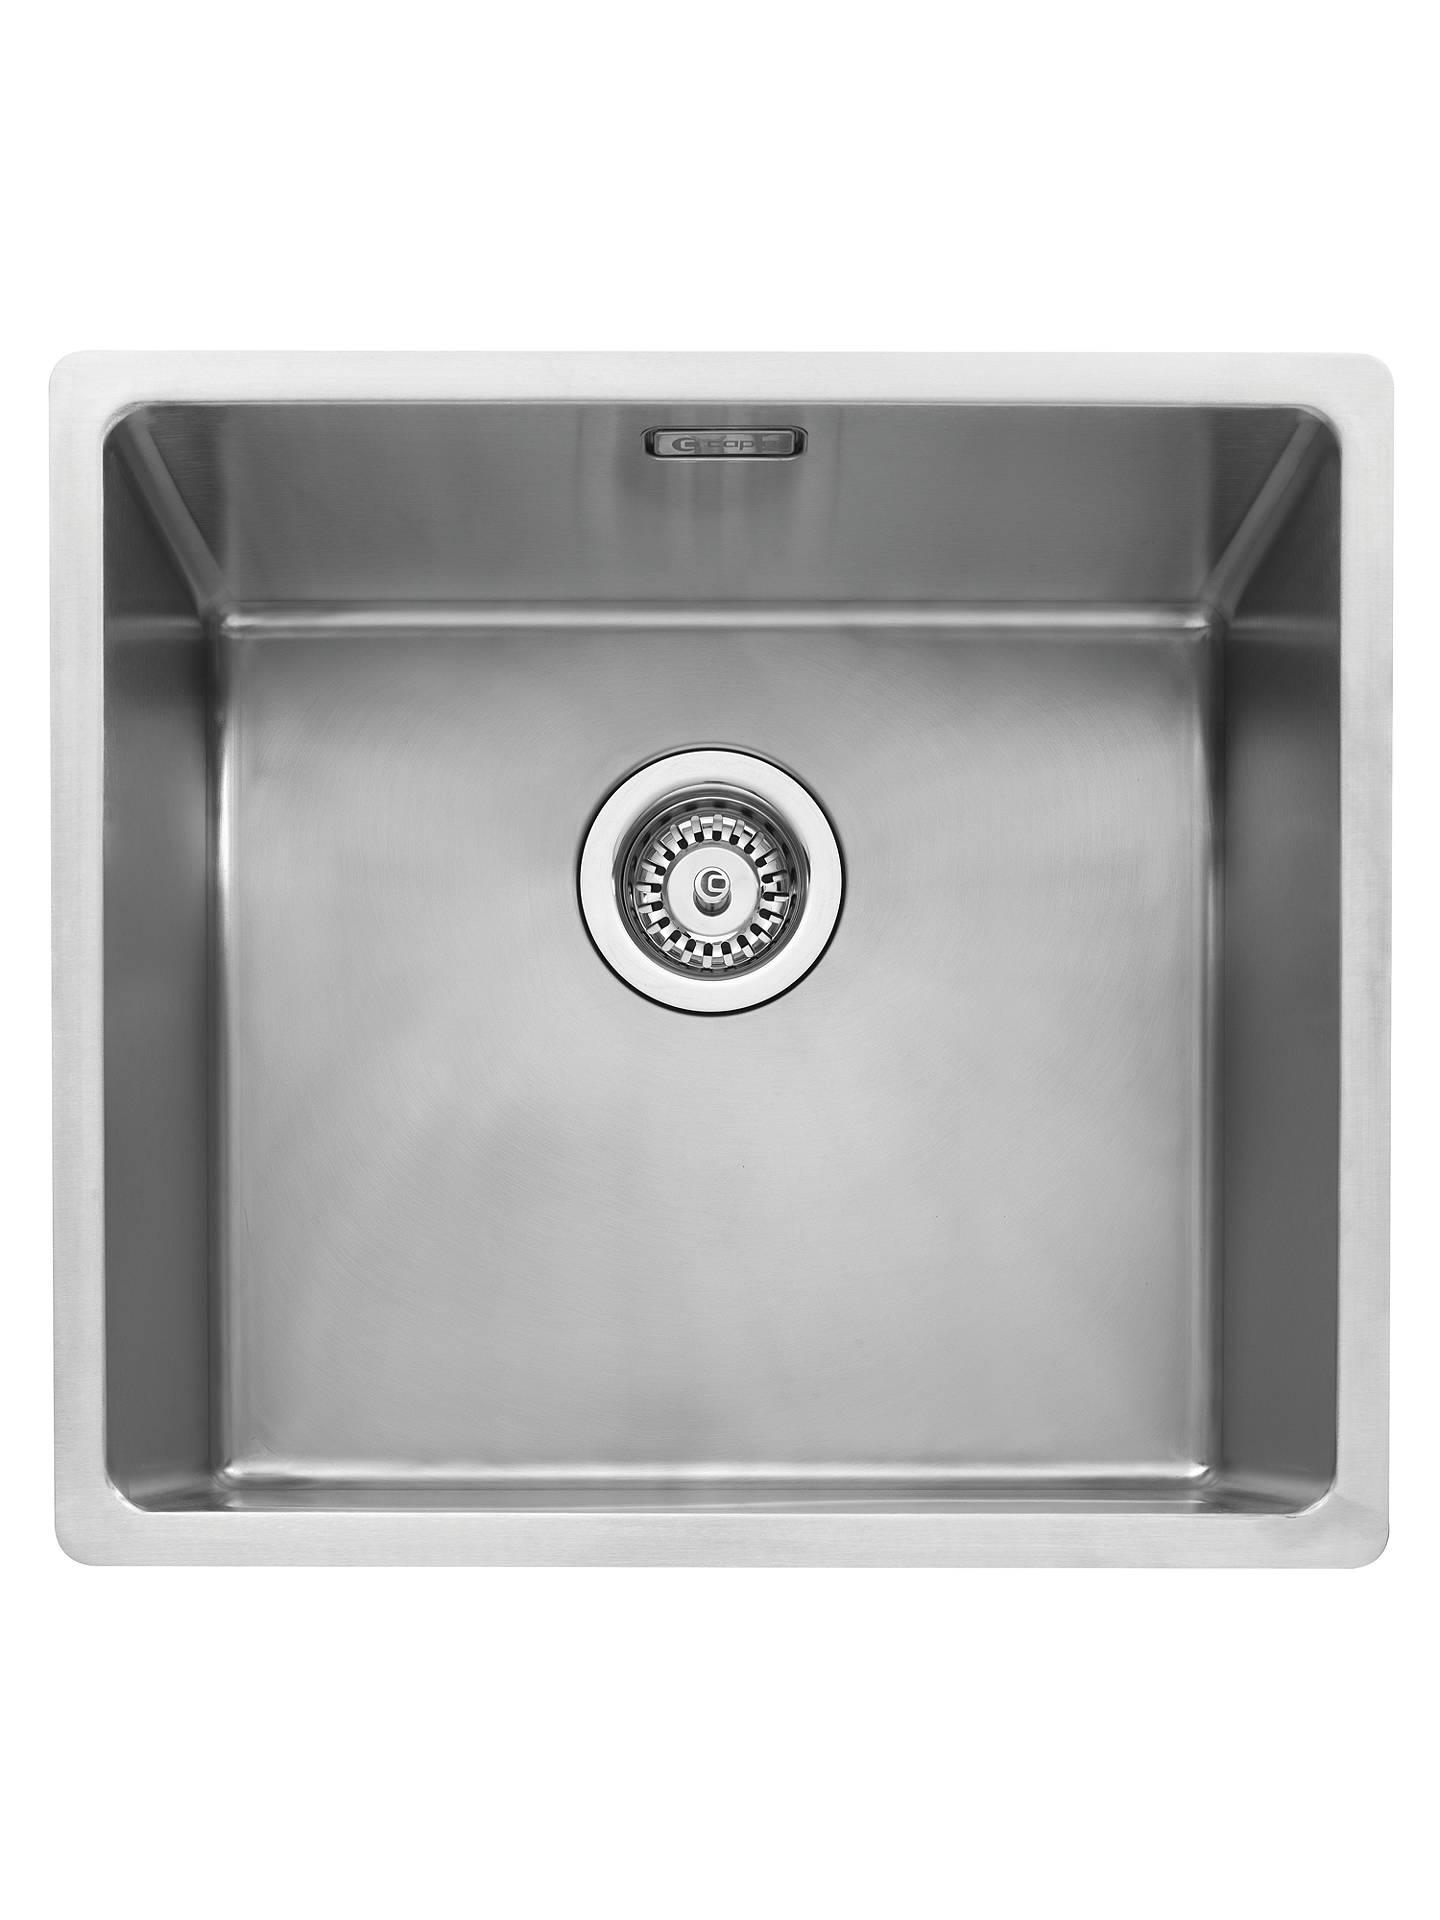 John Lewis Undermount Single Bowl Kitchen Sink, Stainless